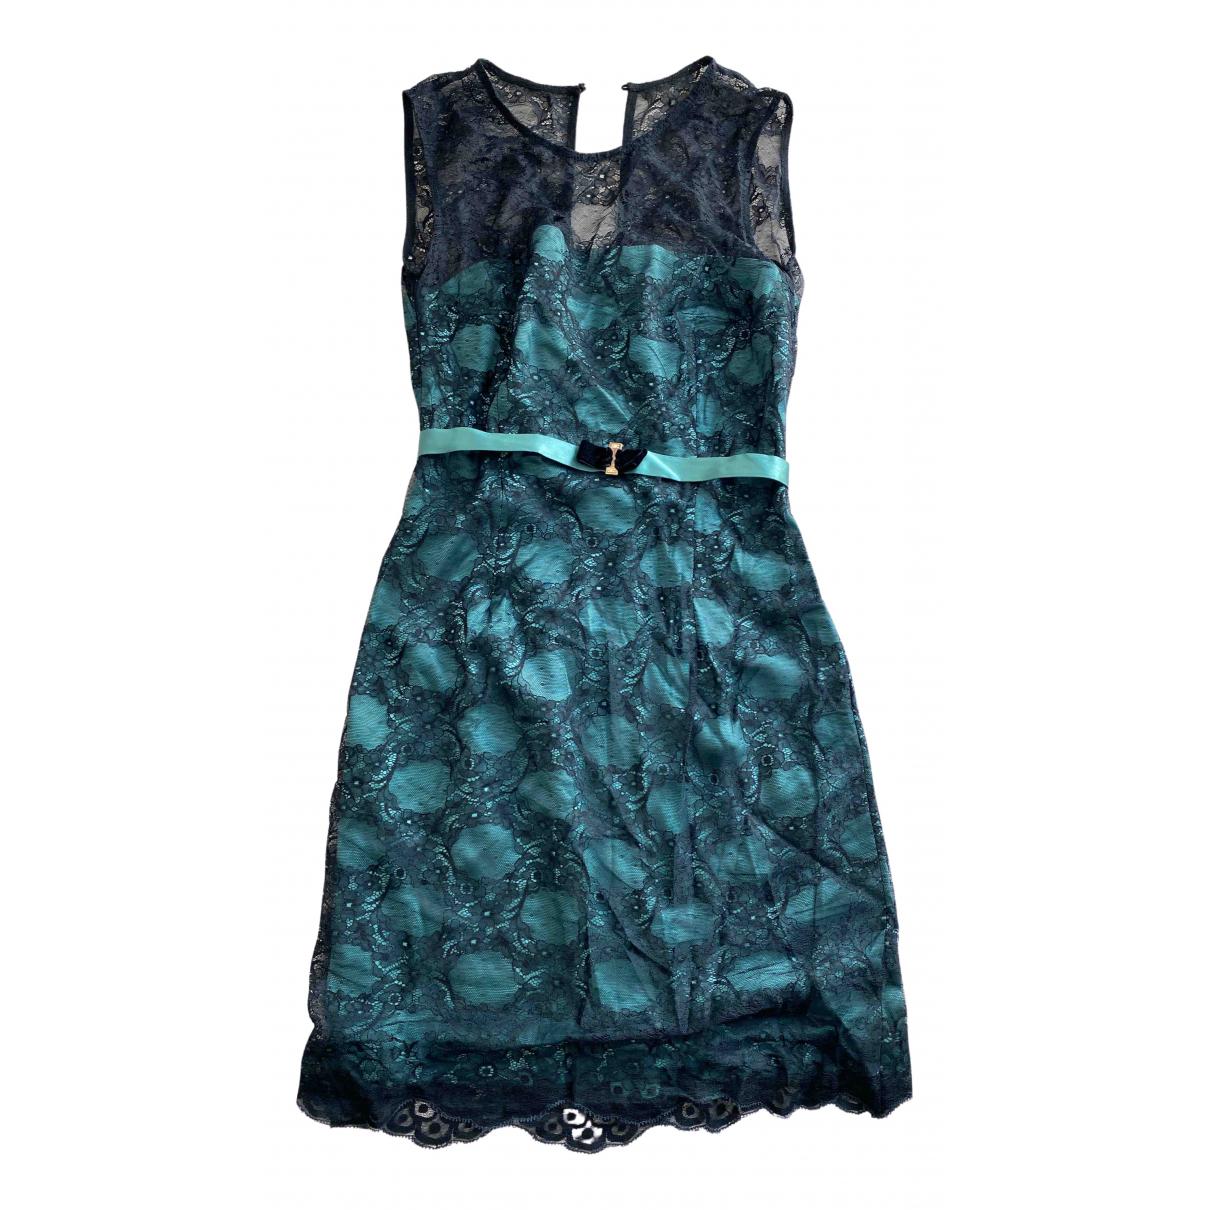 Elisabetta Franchi \N Green Lace dress for Women 42 FR